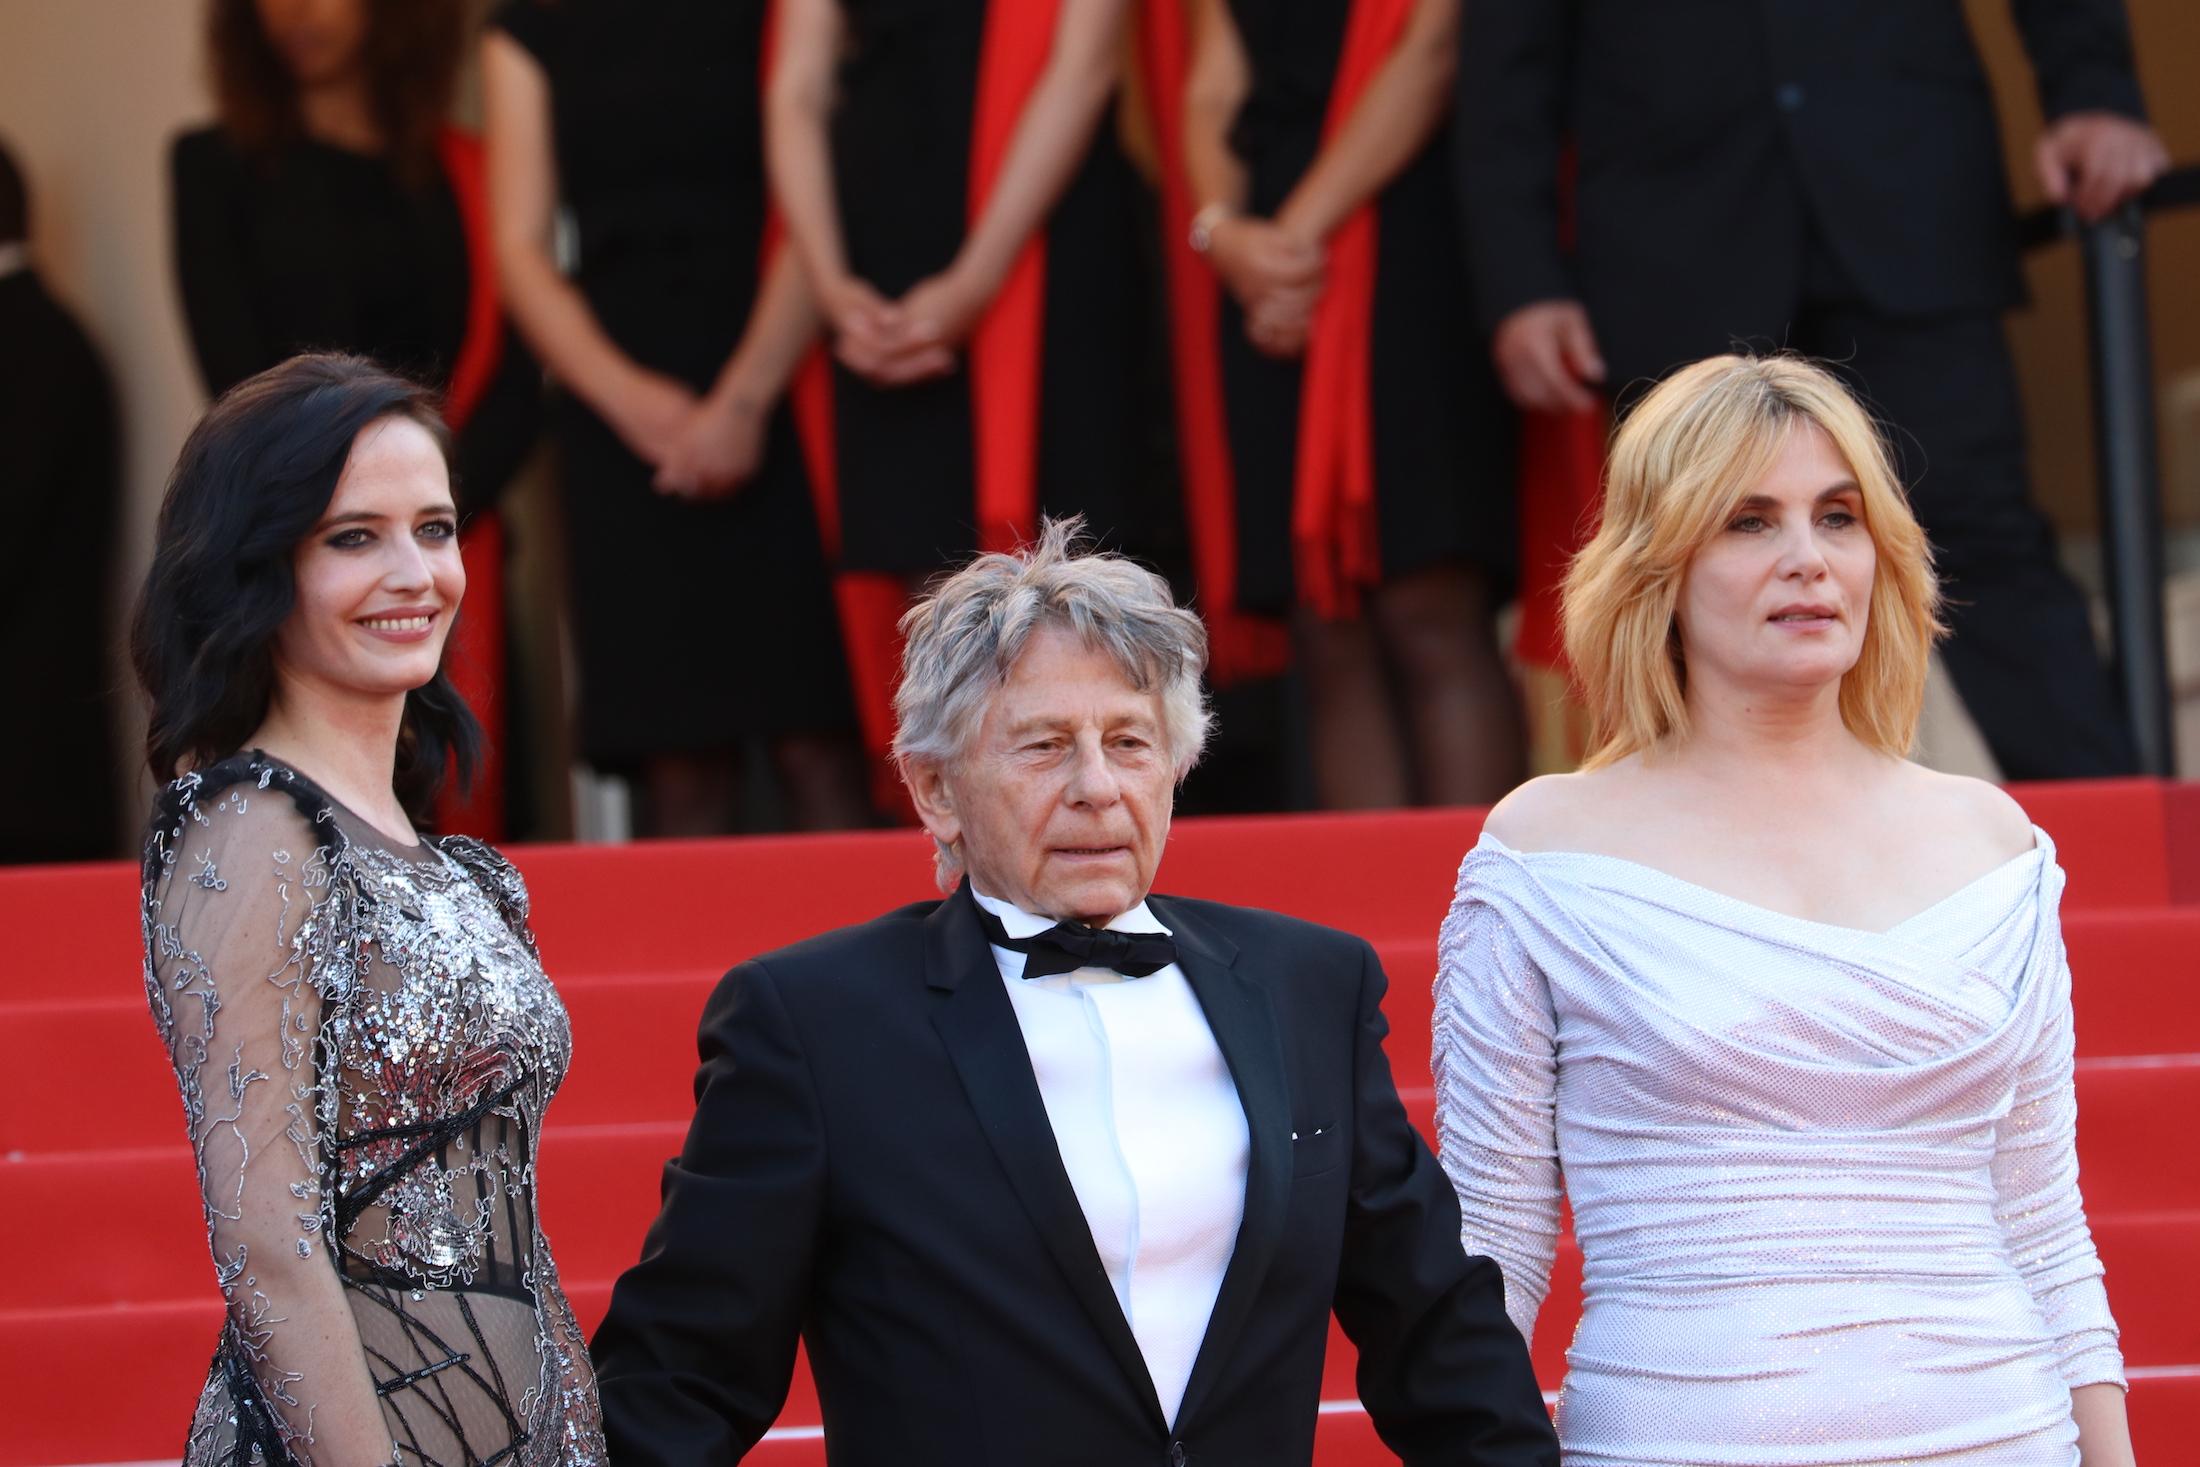 Cannes 2017: Roman Polanski, Eva Green, Emmanuelle Seigner sul red carpet di Based on a True Story